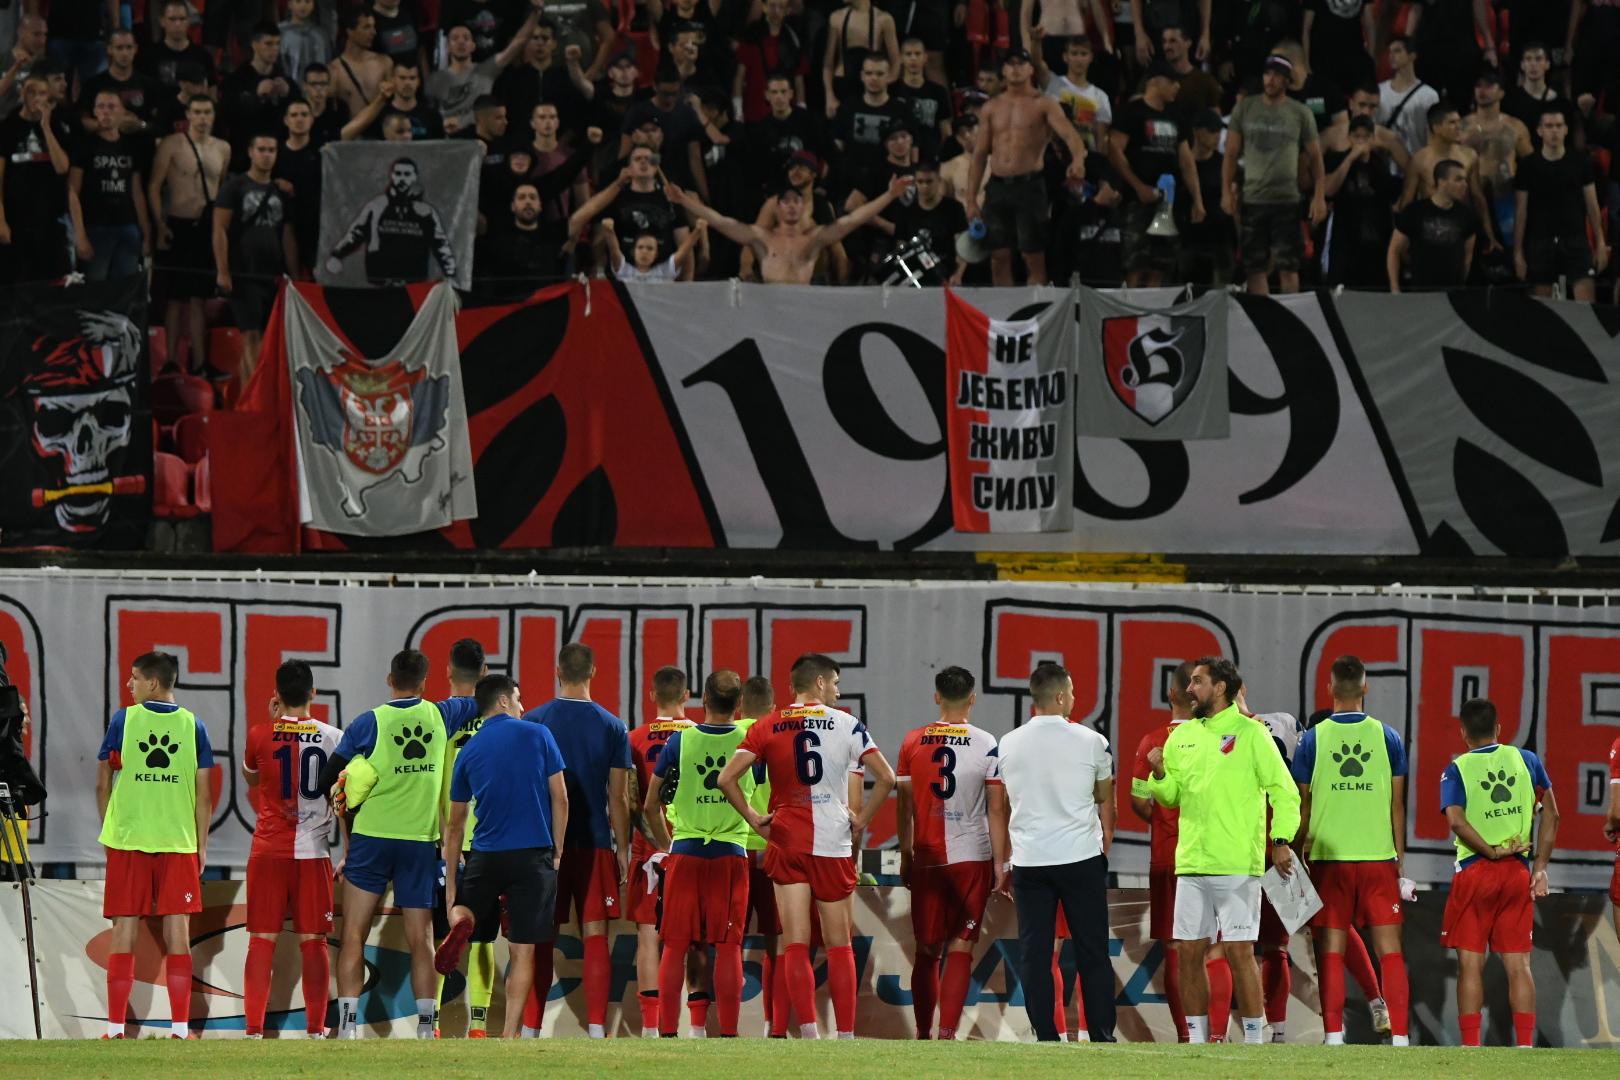 Novi Sad 05.08.2021. Vojvodina, Las, utakmica, fudbal